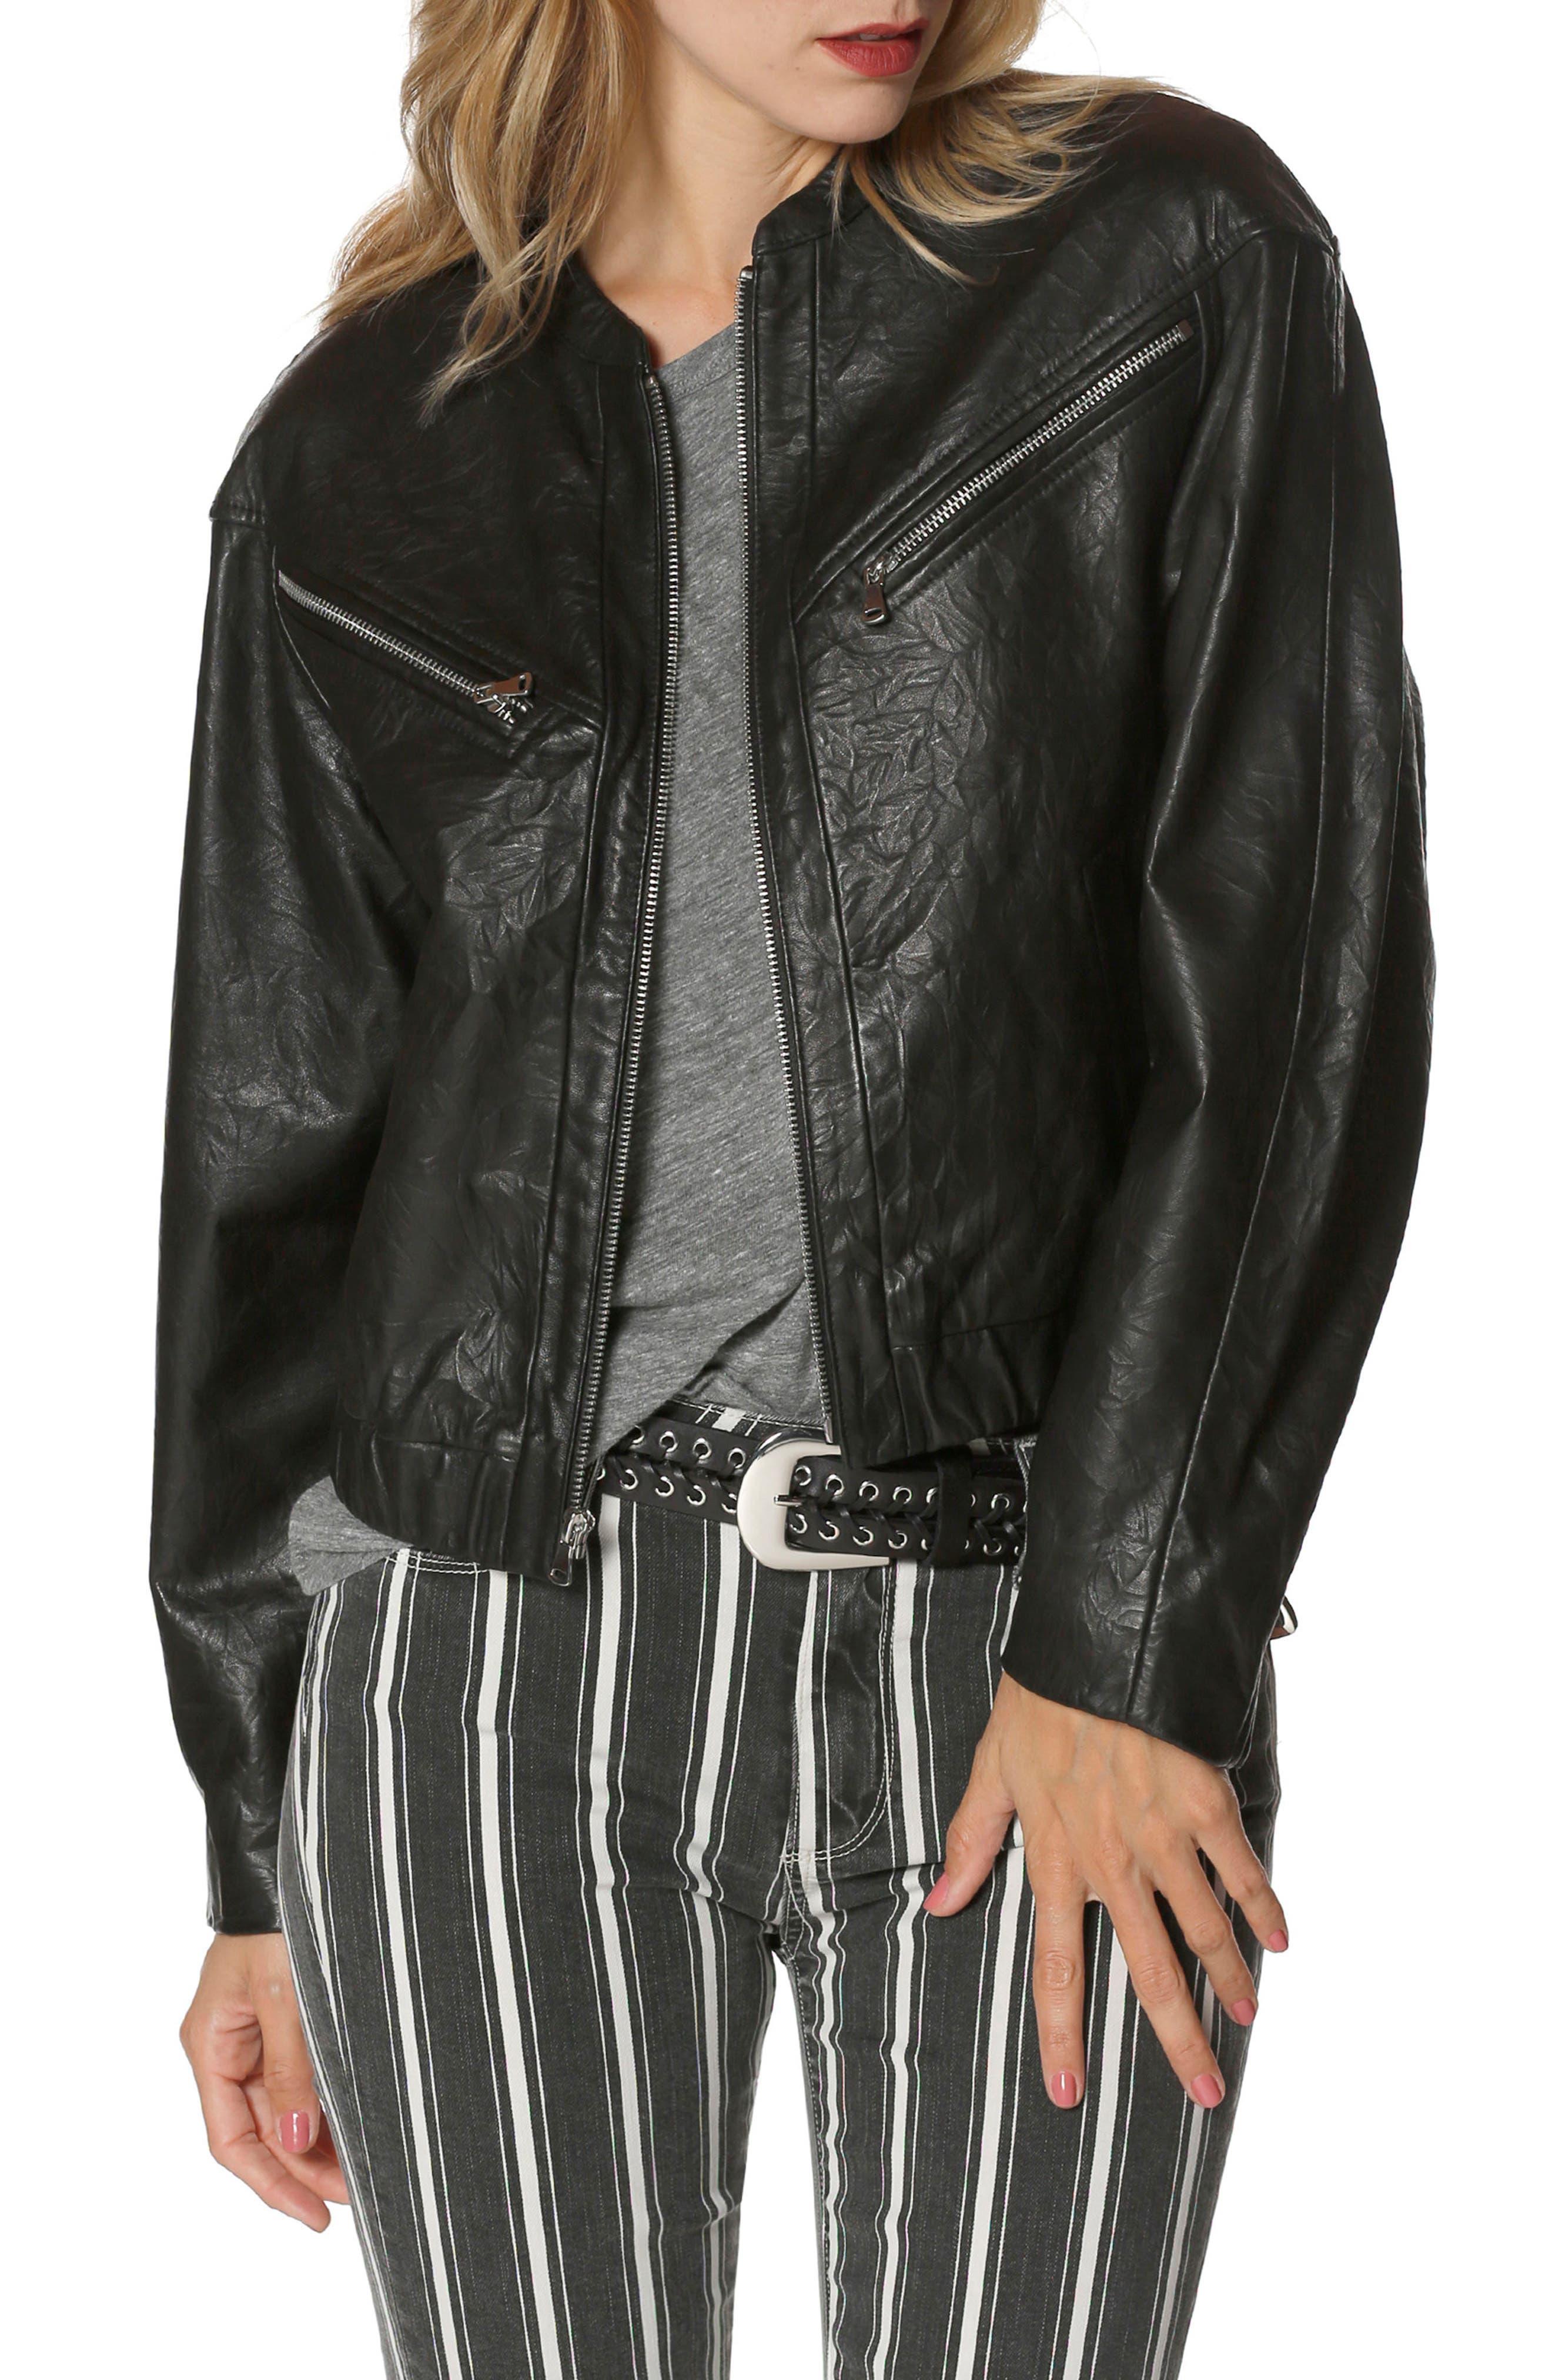 Giana Leather Moto Jacket,                             Main thumbnail 1, color,                             Black